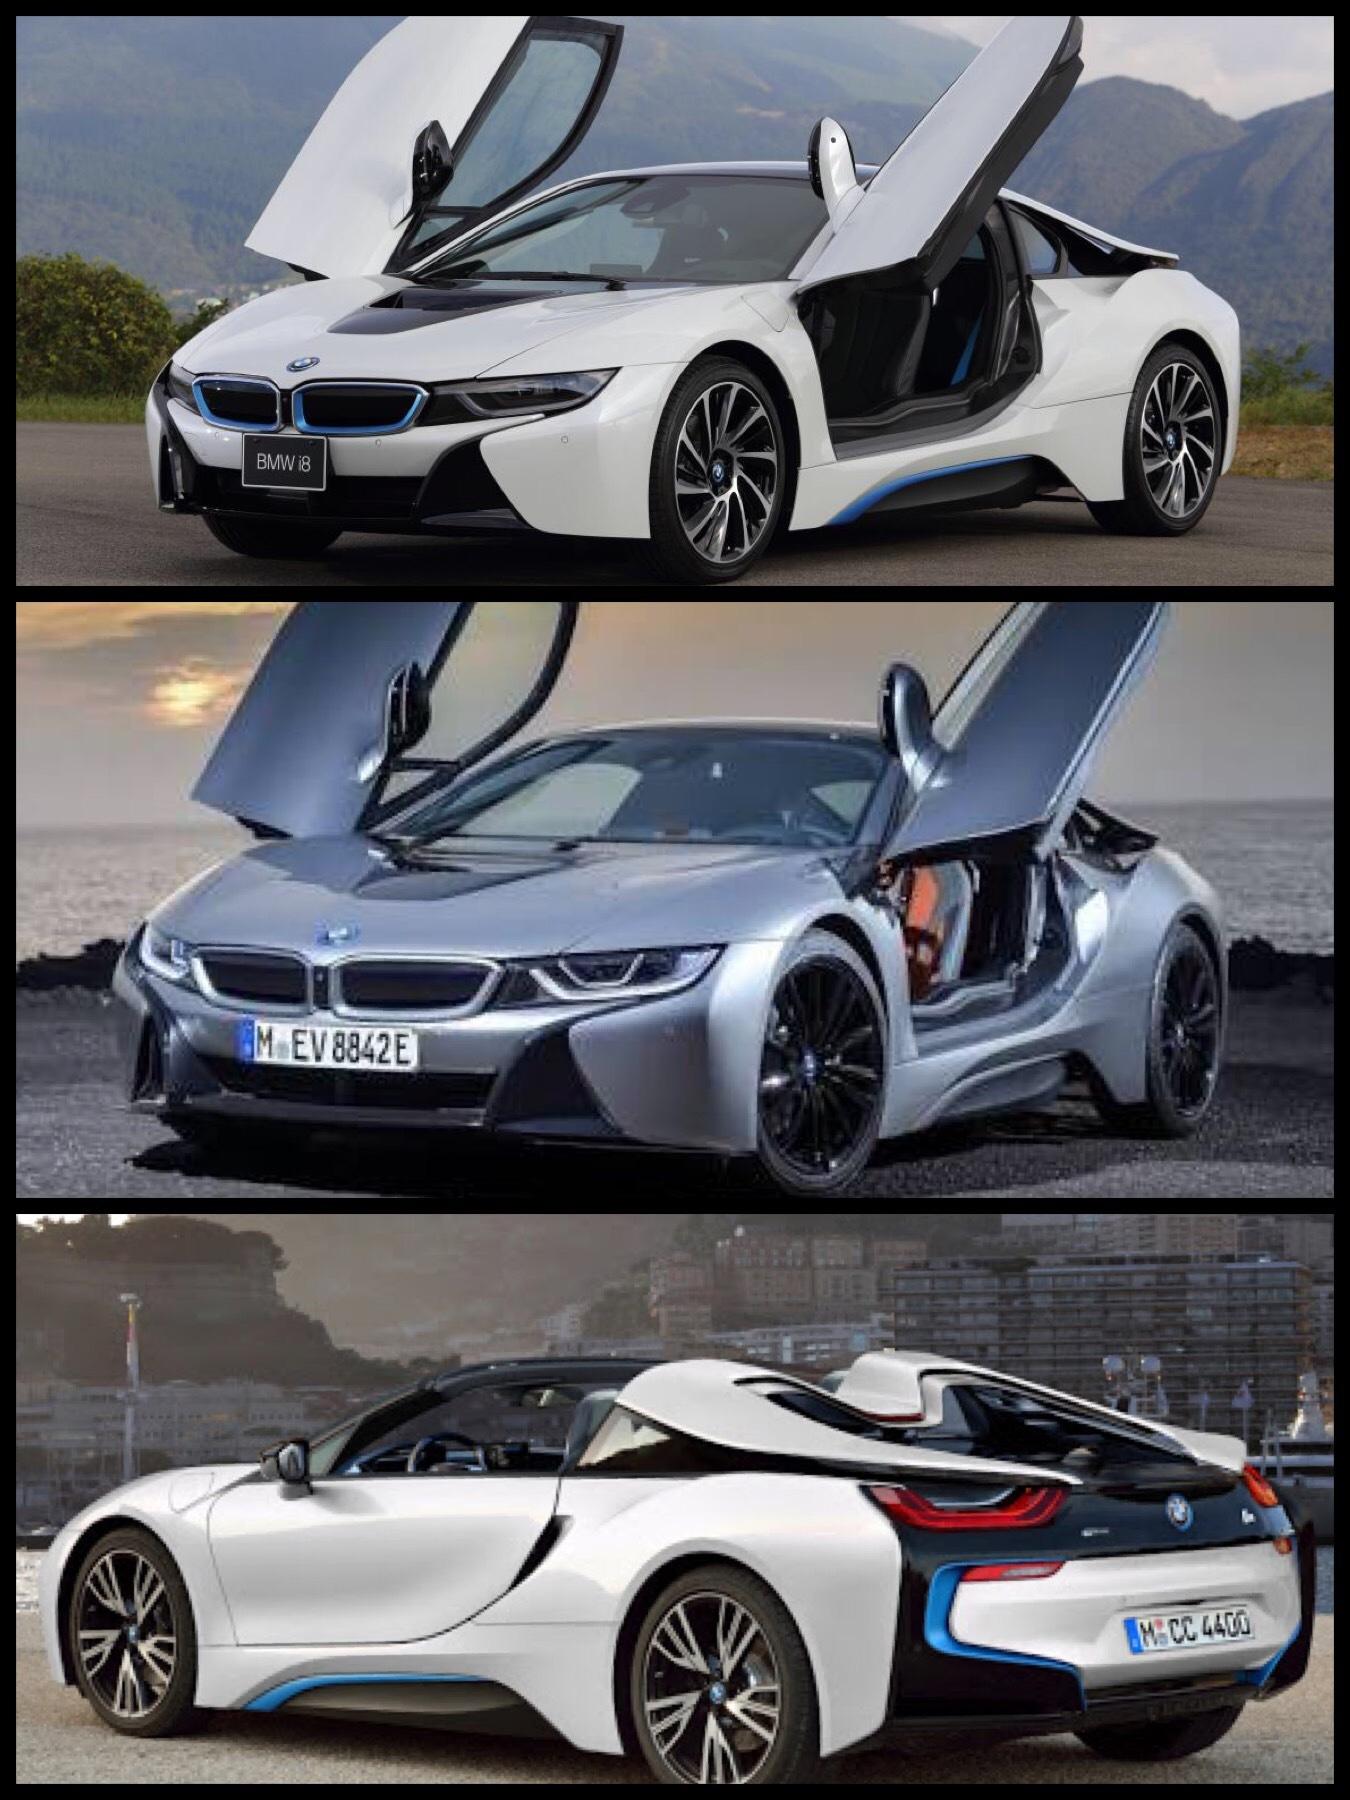 BMW i8 クーペ ロードスター PHEV